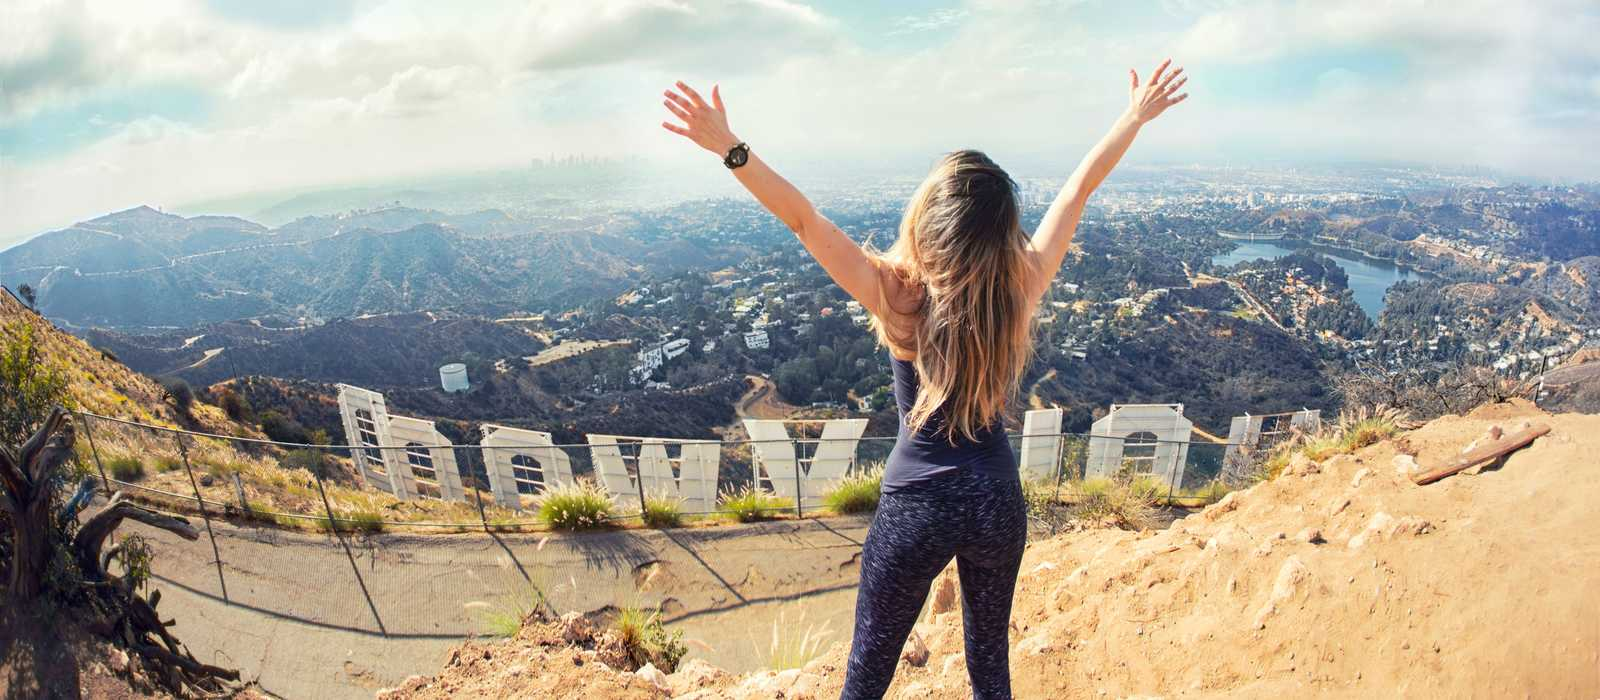 Den Ausblick in den Hollywood Hills über Hollywood in Los Angeles genießen